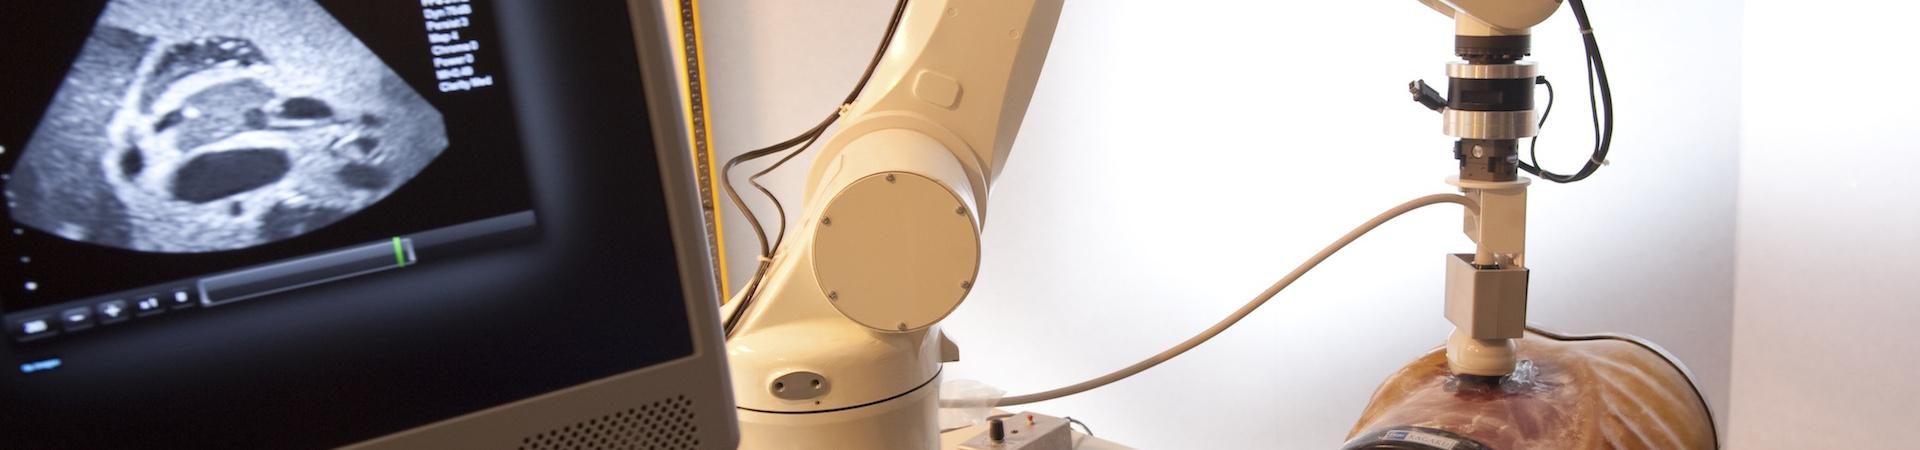 Ultrasound probe guidance by visual-servoing